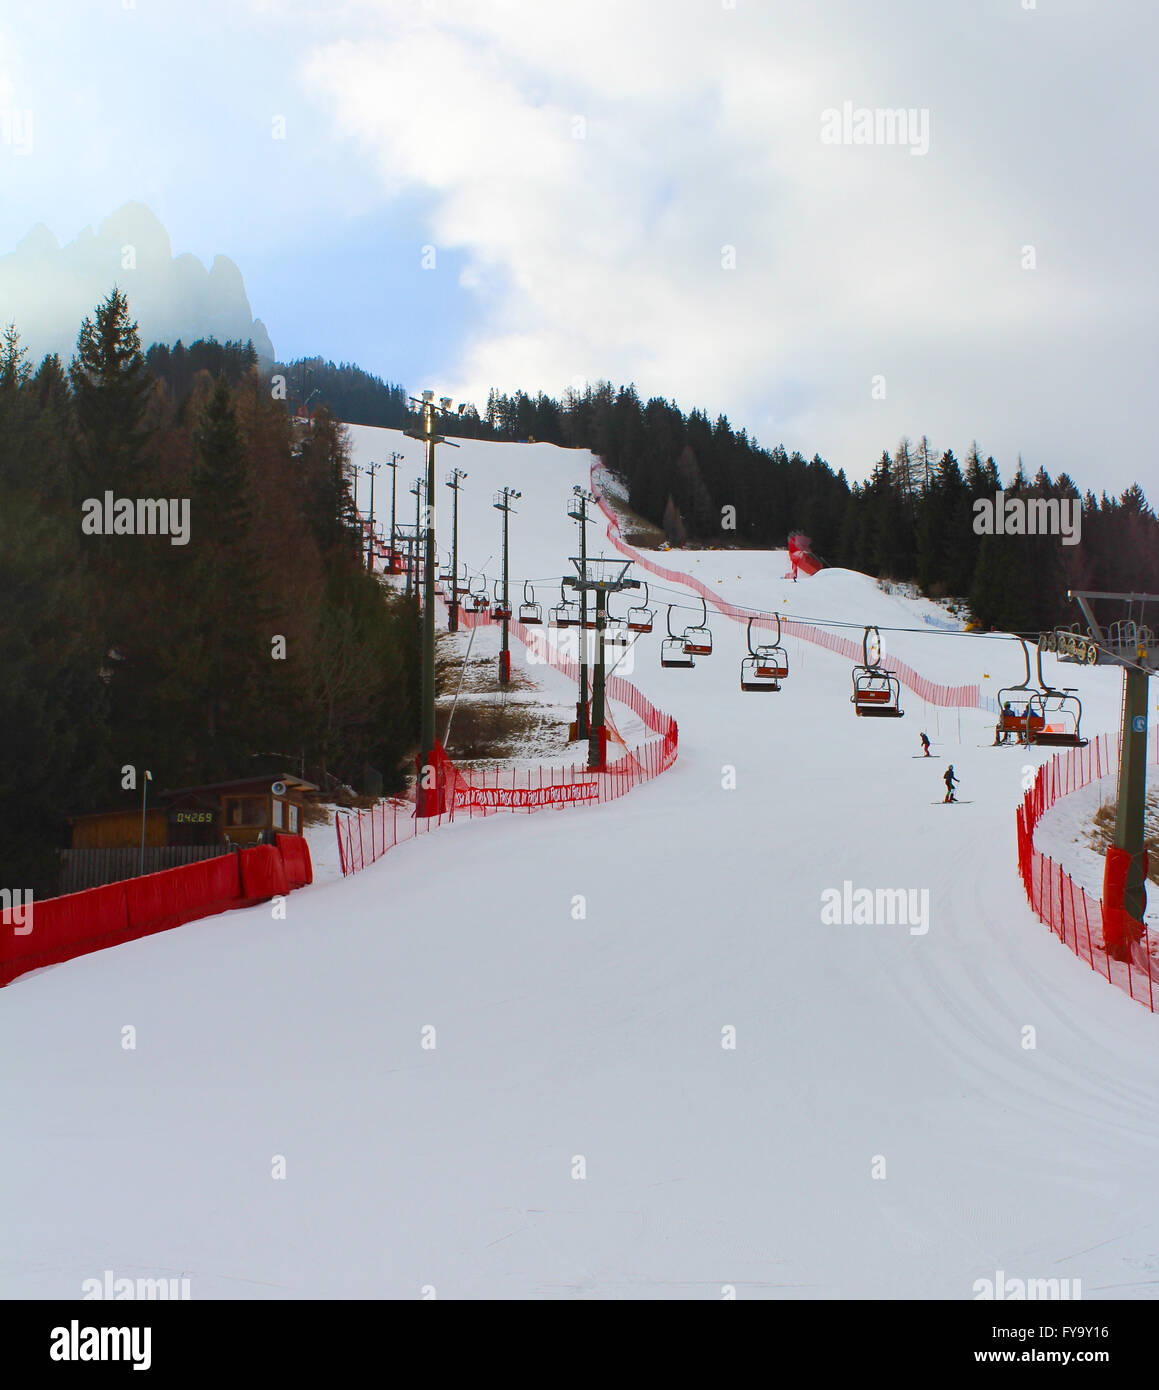 Skiers tackle a downhill run in the mountain town of Pozza Di Fassa, Trentino, Italy - Stock Image